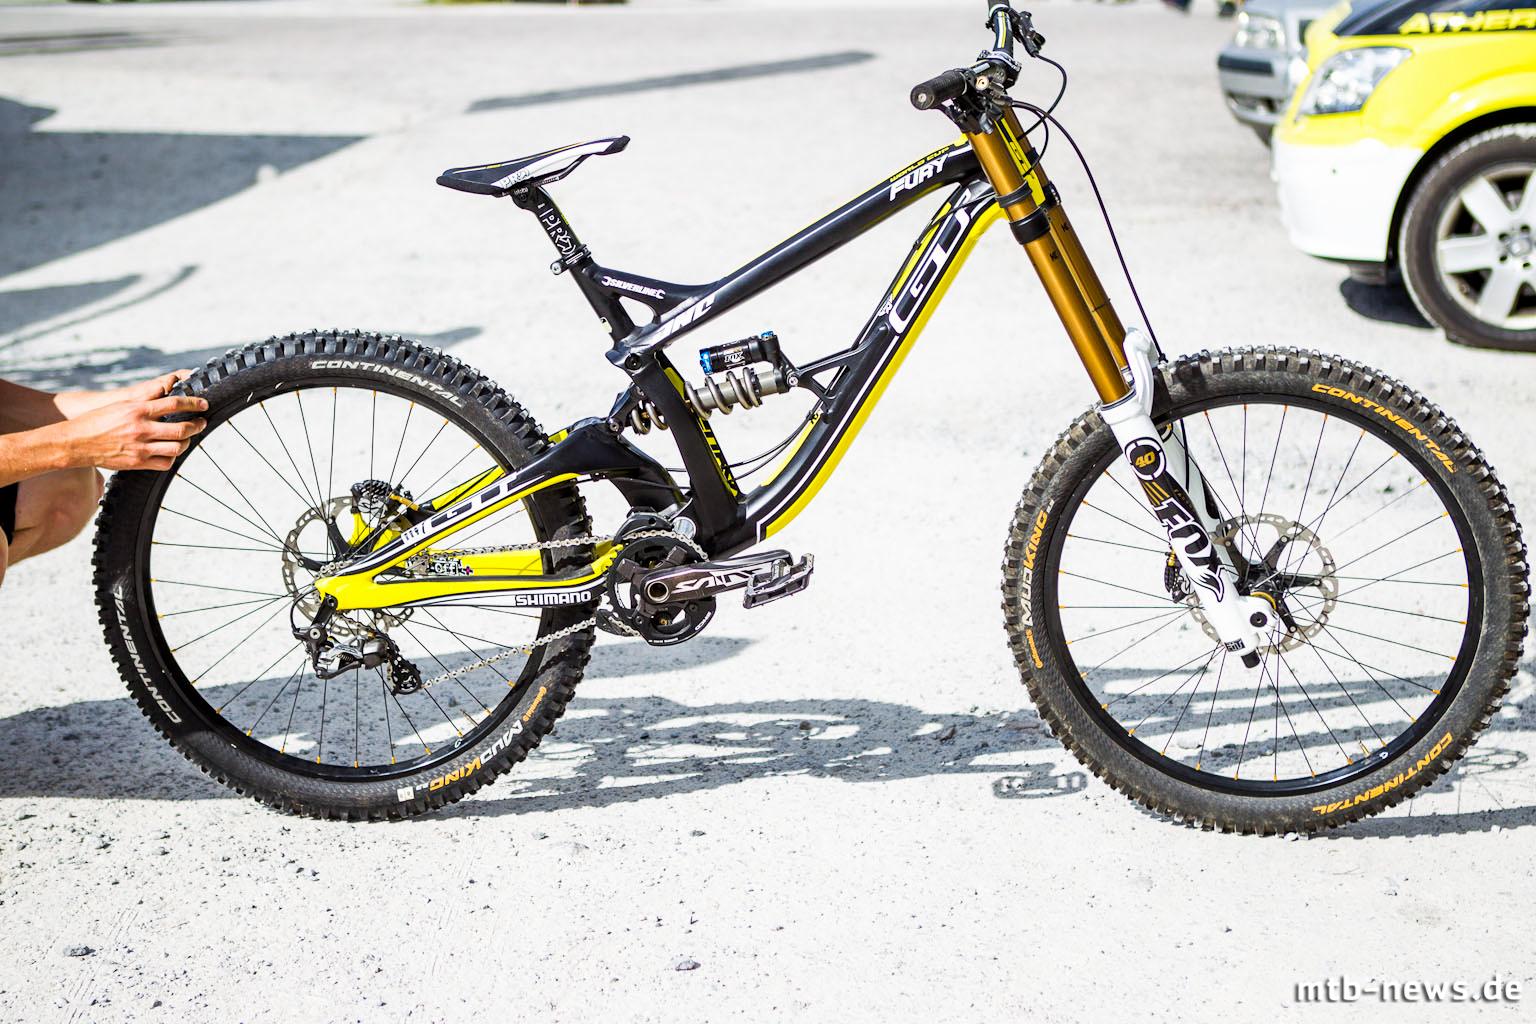 GT Fury World Cup 2014: neue Evolutionsstufe des Atherton-DH-Bikes